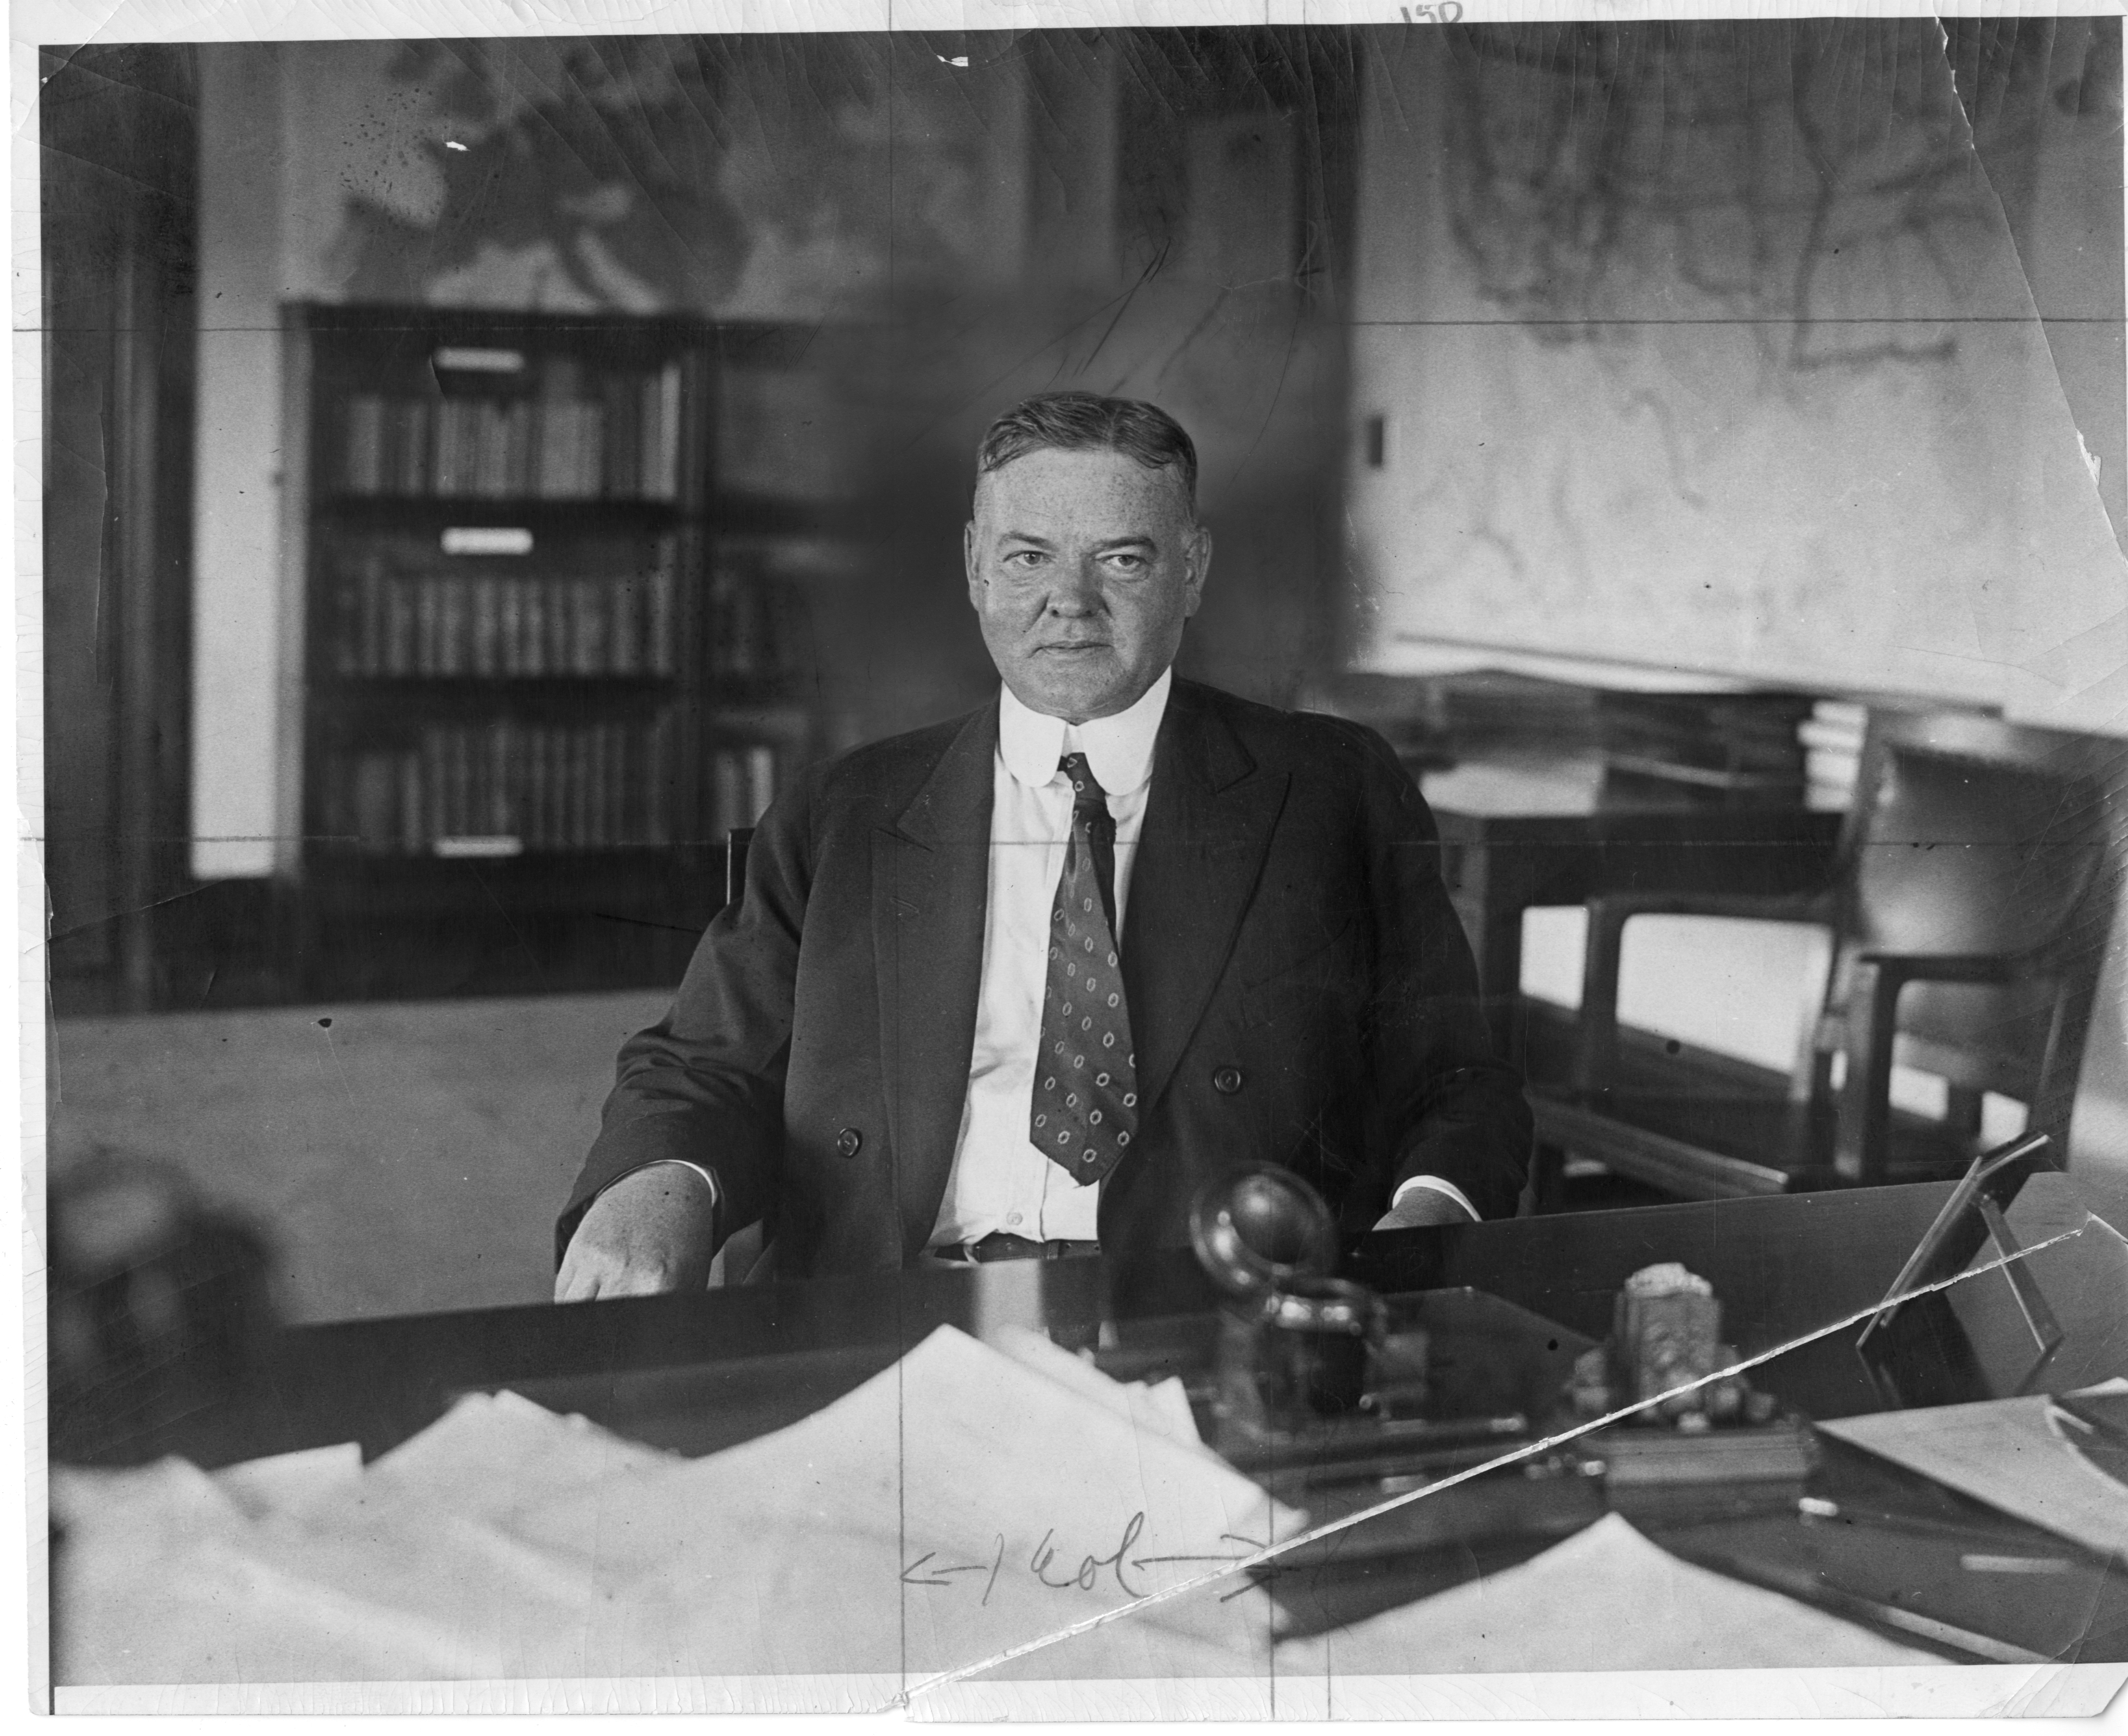 Herbert Hoover before becoming President